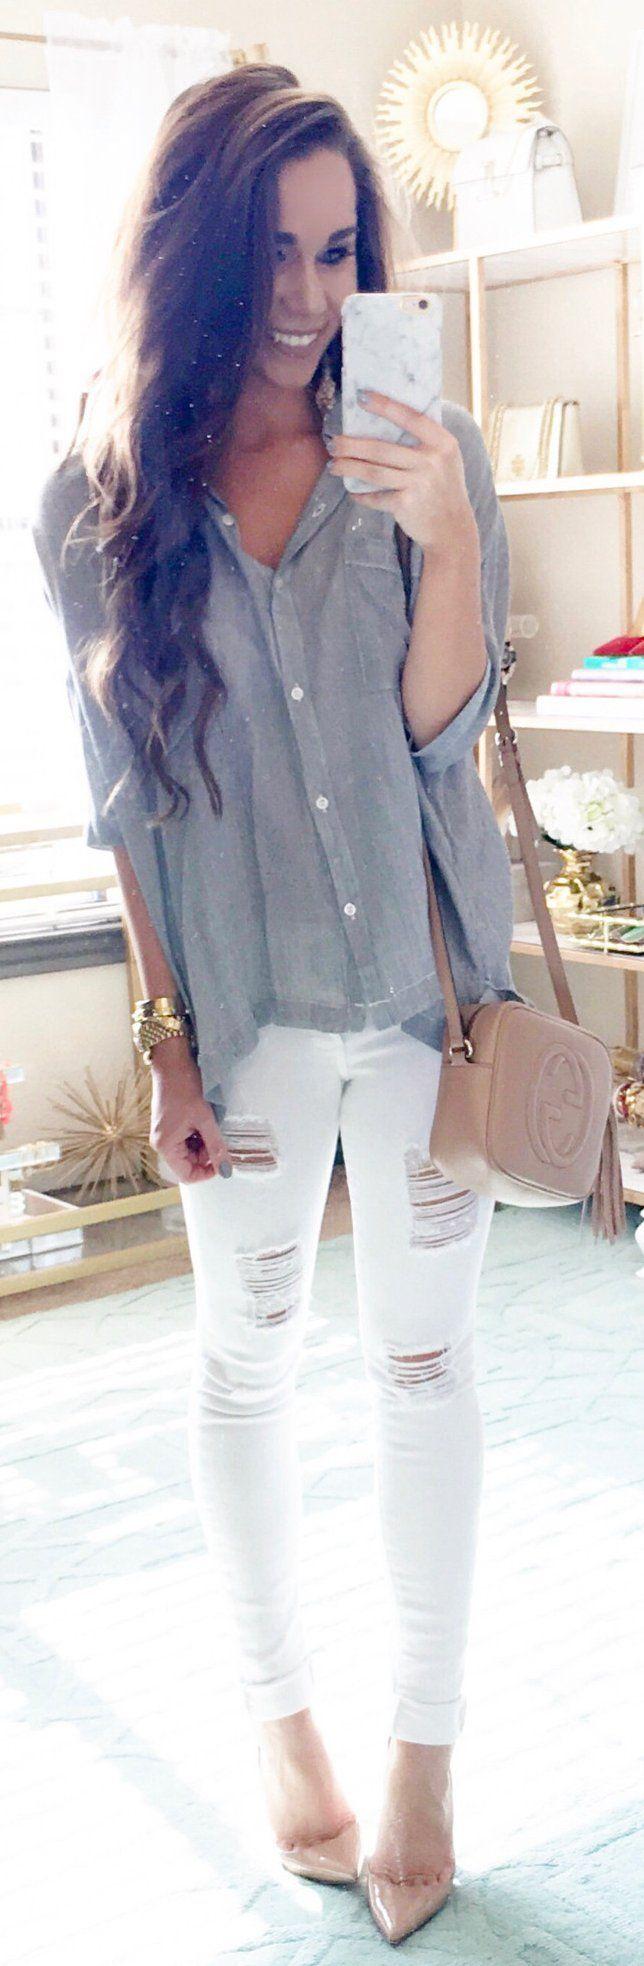 Grey Shirt / White Ripped Skinny Jeans / Beige Pumps / Beige Leather Shoulder Bag